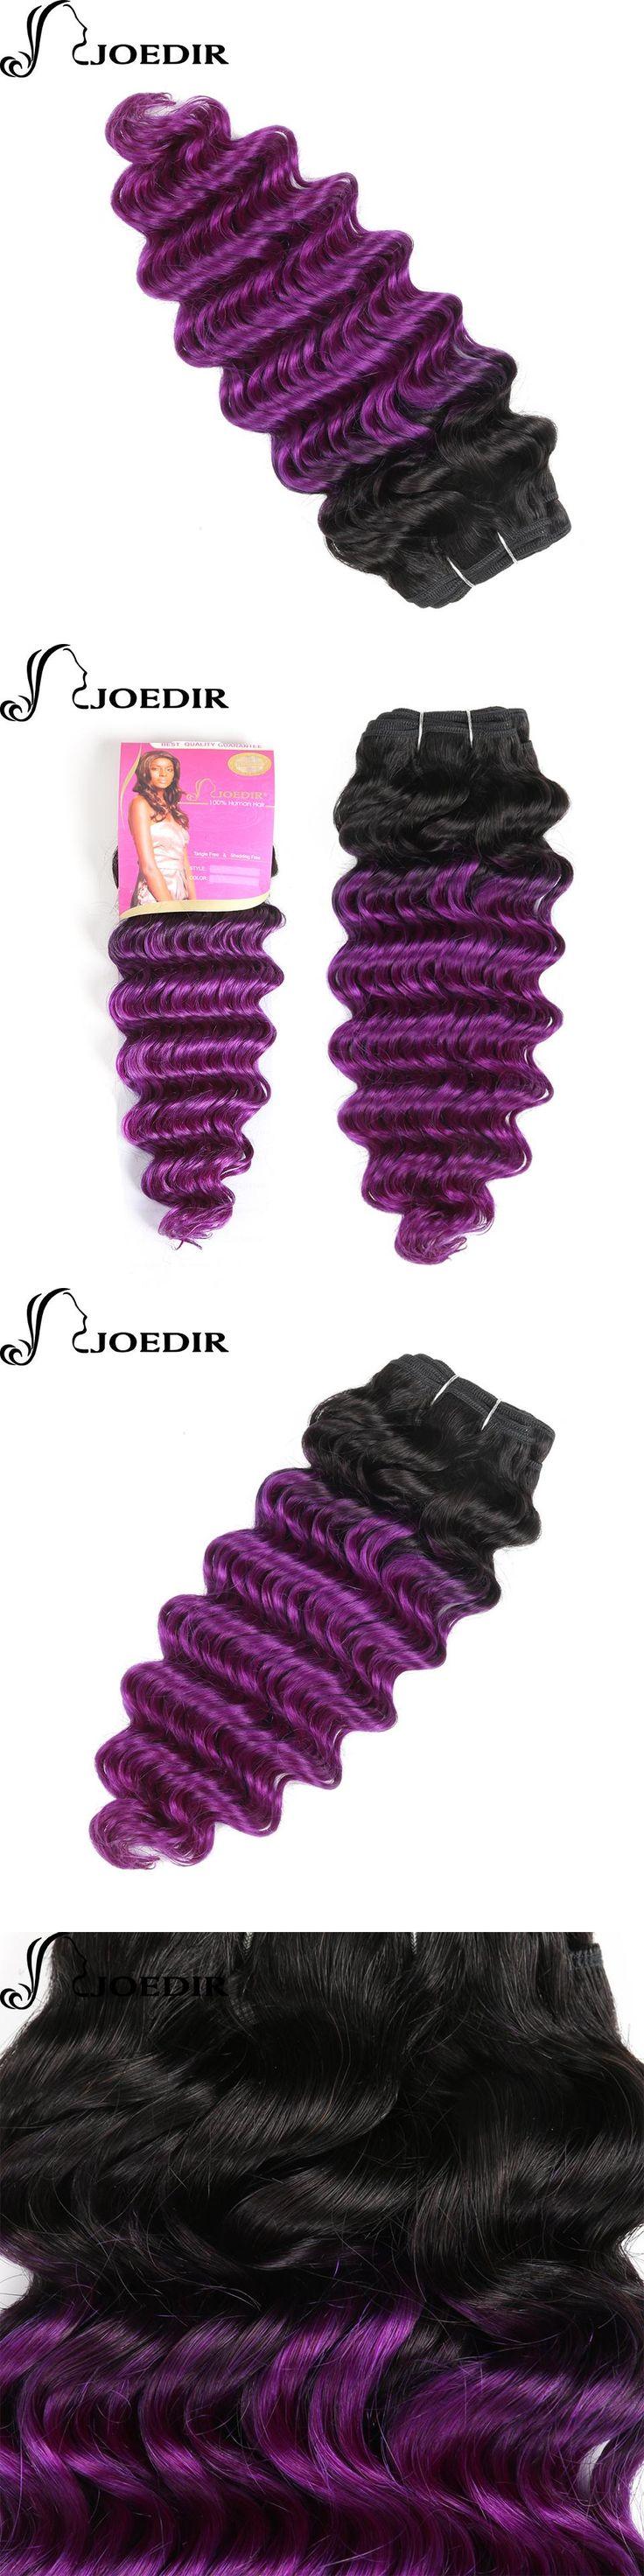 Joedir Pre-Colored Deep Wave Indian Hair 1 Bundles Ombre Purple  Human Hair Bundles Remy Hair Weave T1bPurple  Hair Extensions